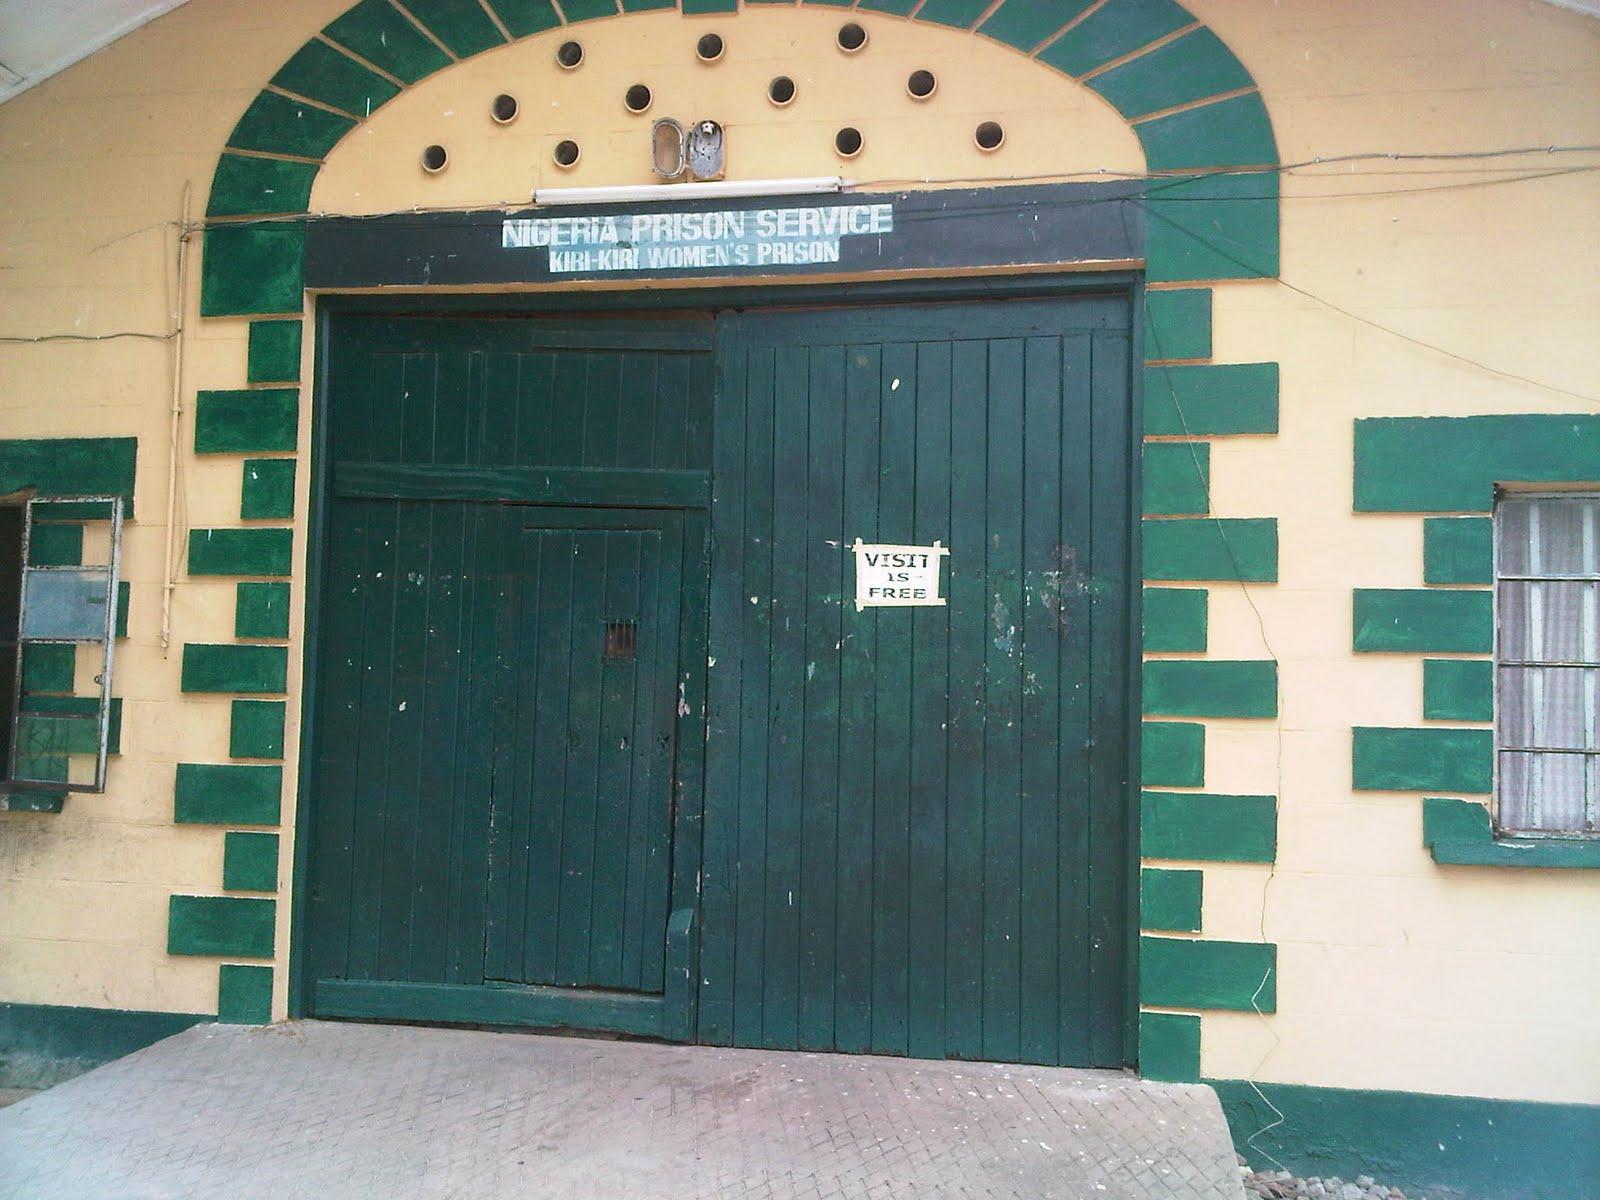 Nigeria: UK plans 112-bed prison annex in Kiri Kiri Prison